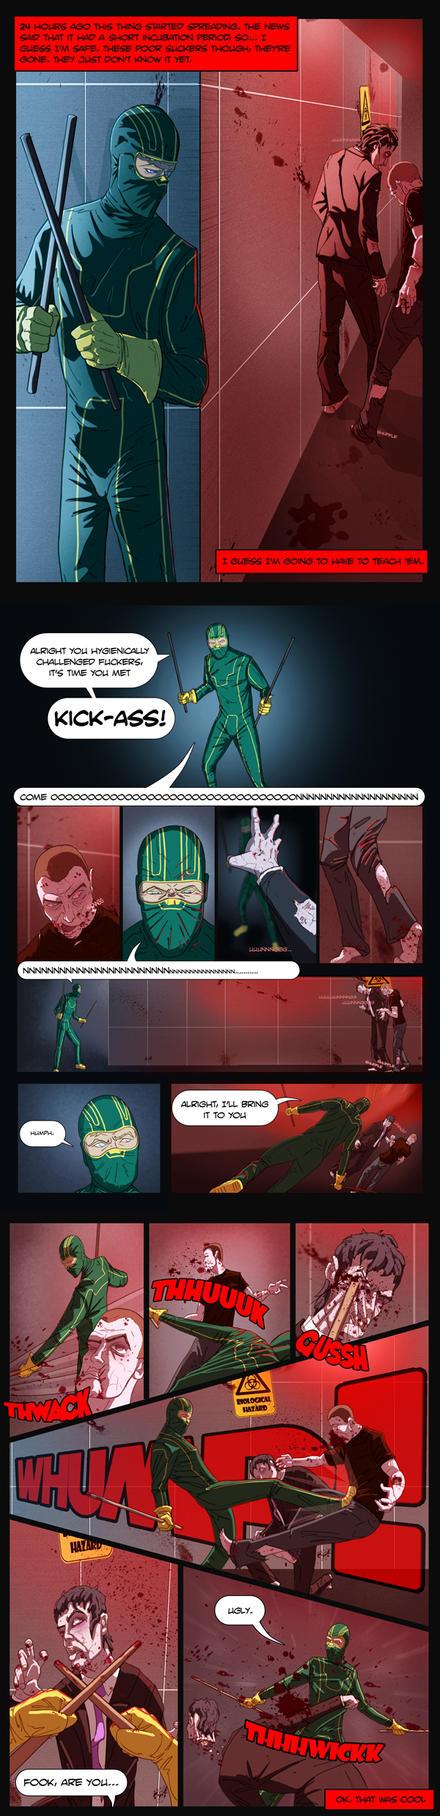 Kick-Ass vs The Zombies by Juggertha